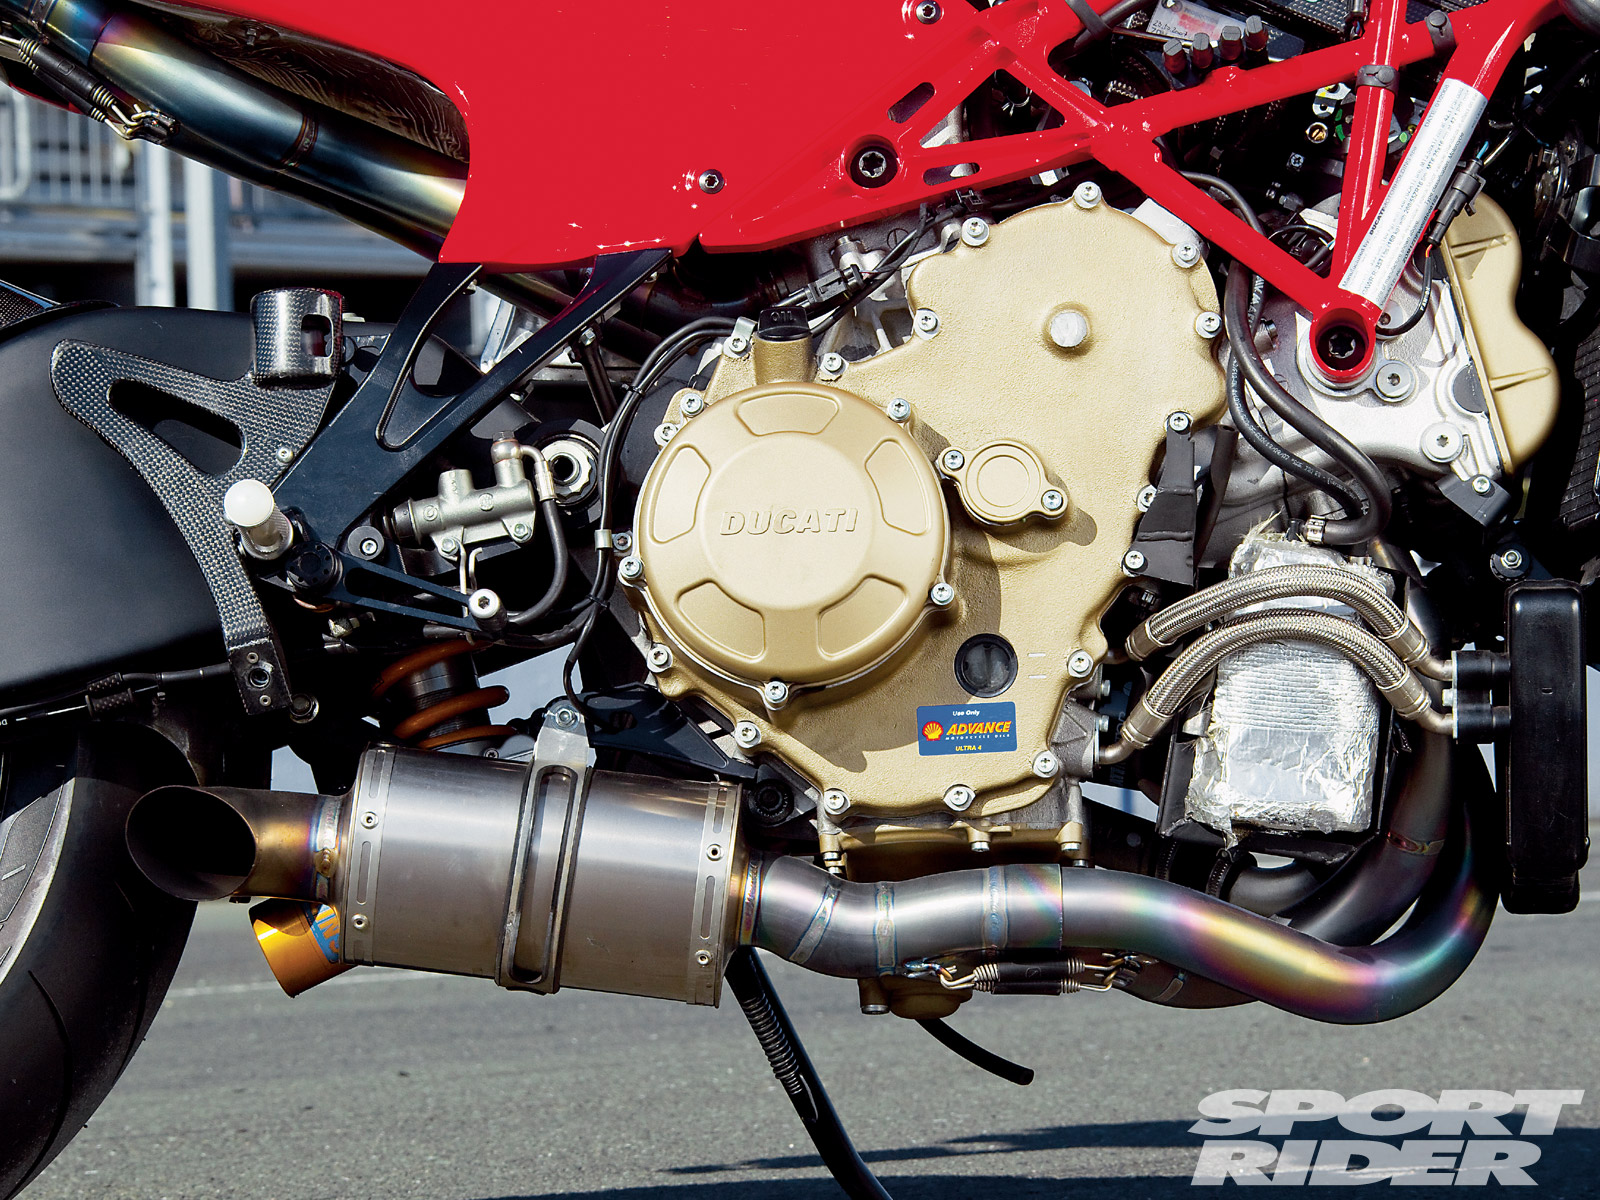 DUCATI DESMOSEDICI RR engine